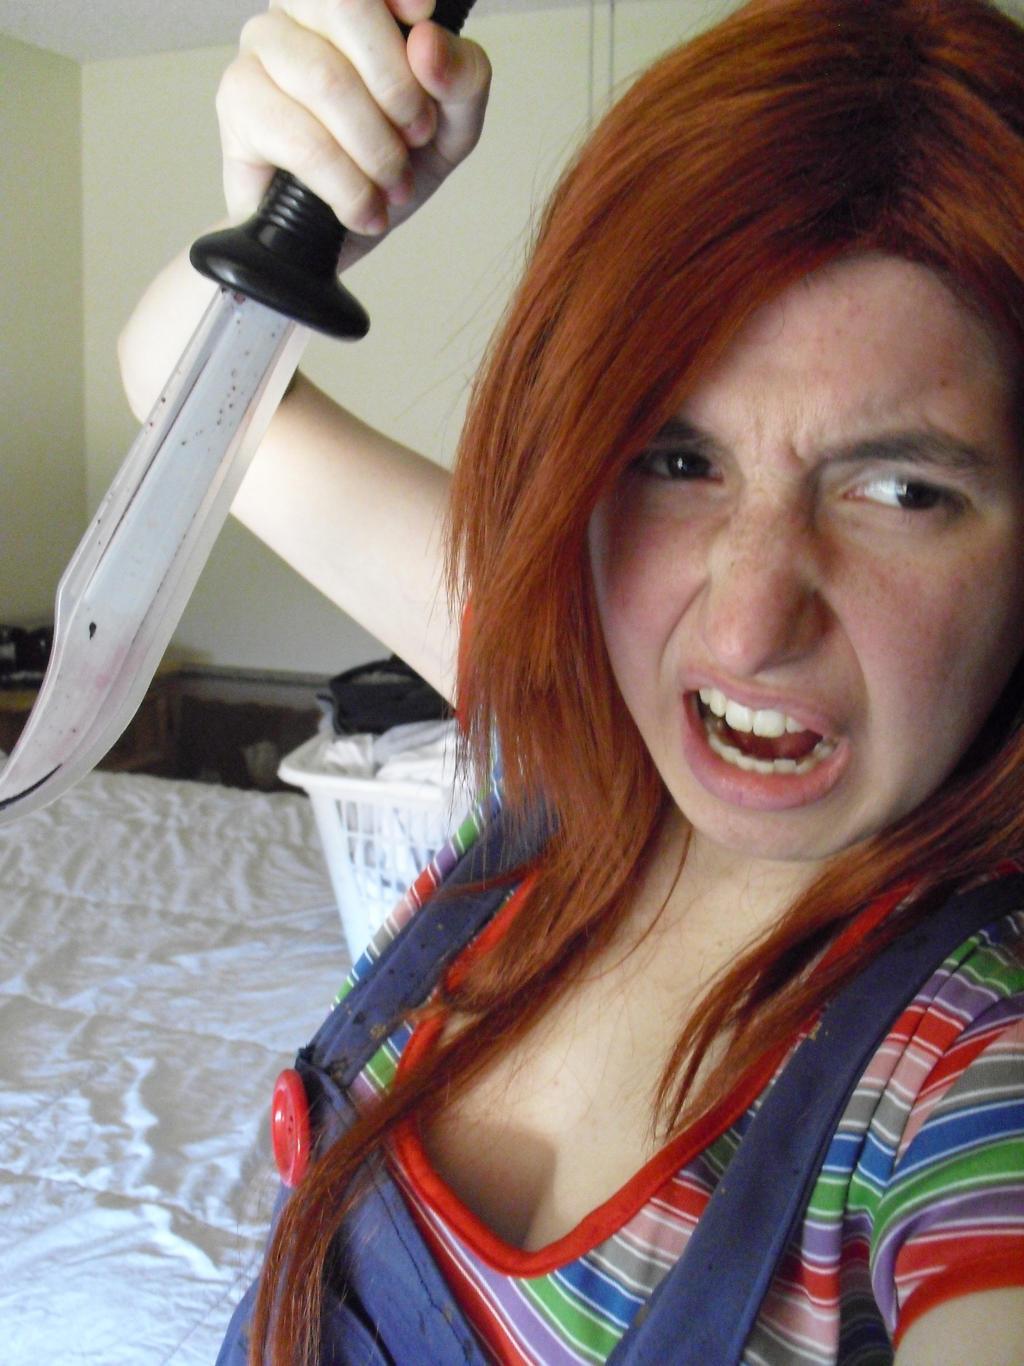 Angry Sexy Chucky By Sonicshadowlover13 On Deviantart